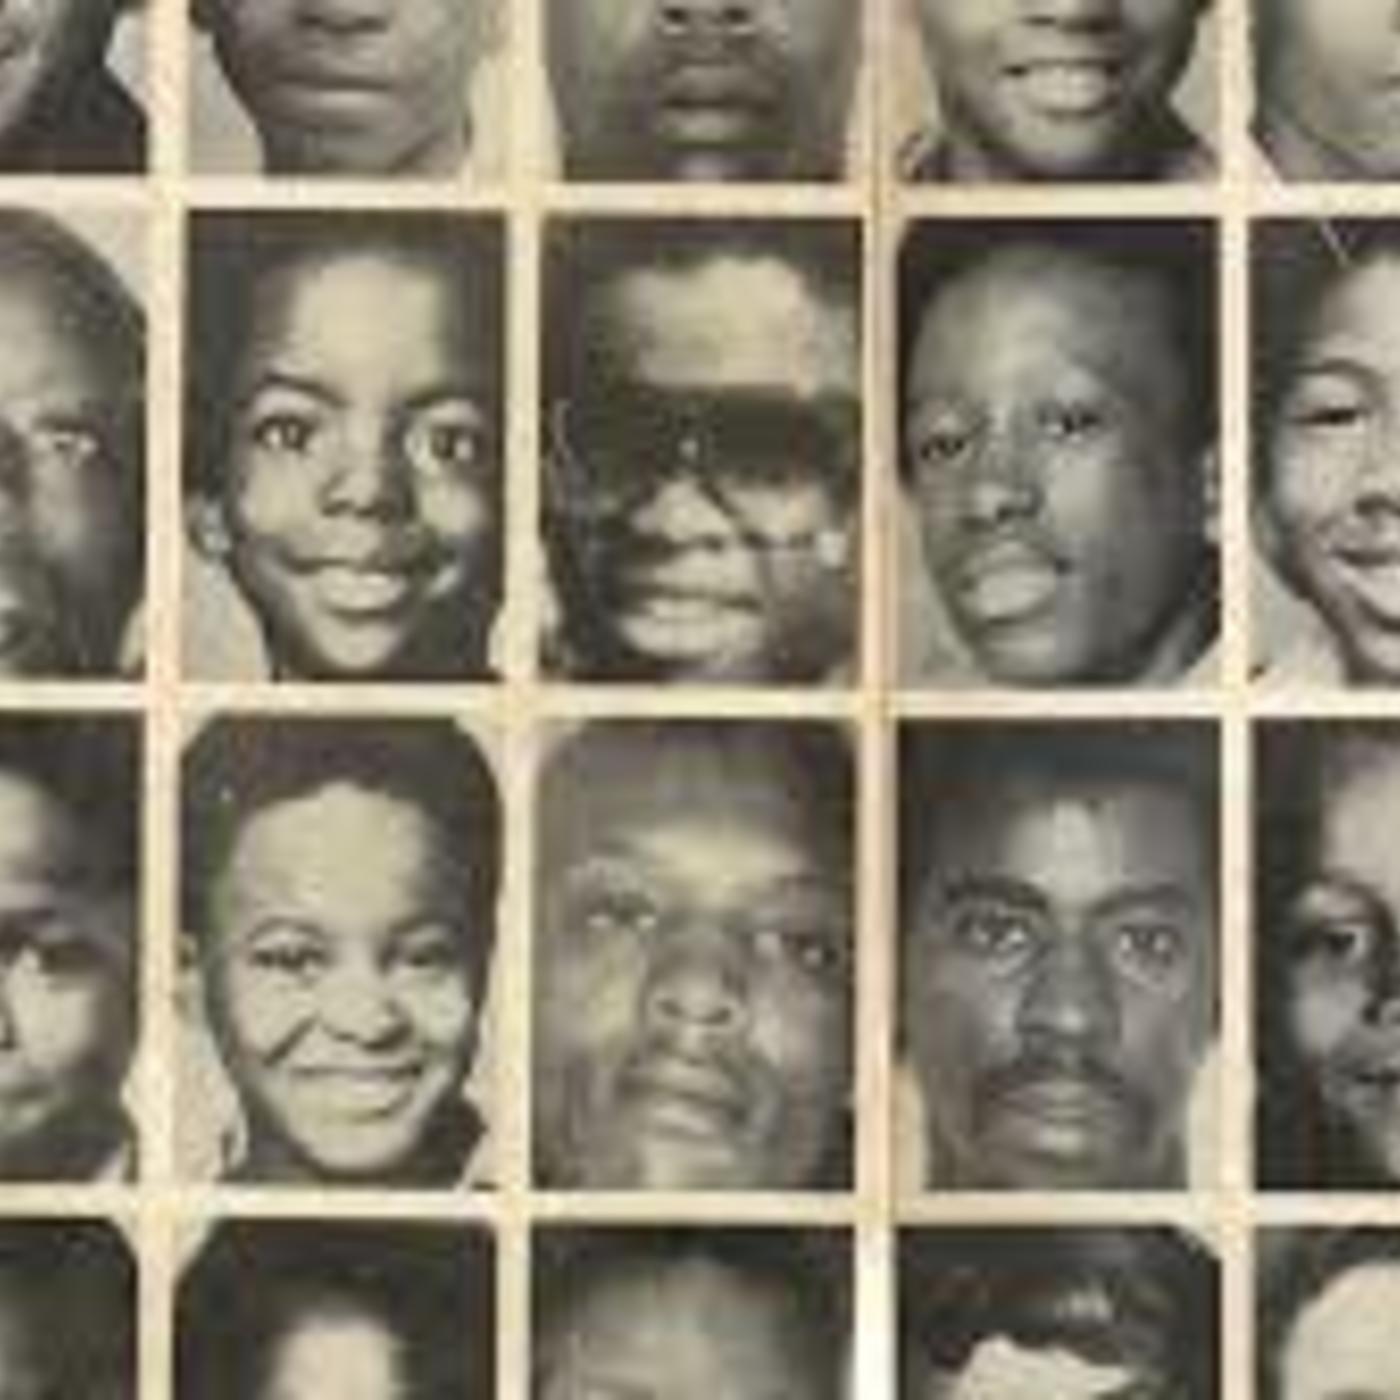 45: Atlantan murhat 1979-1981